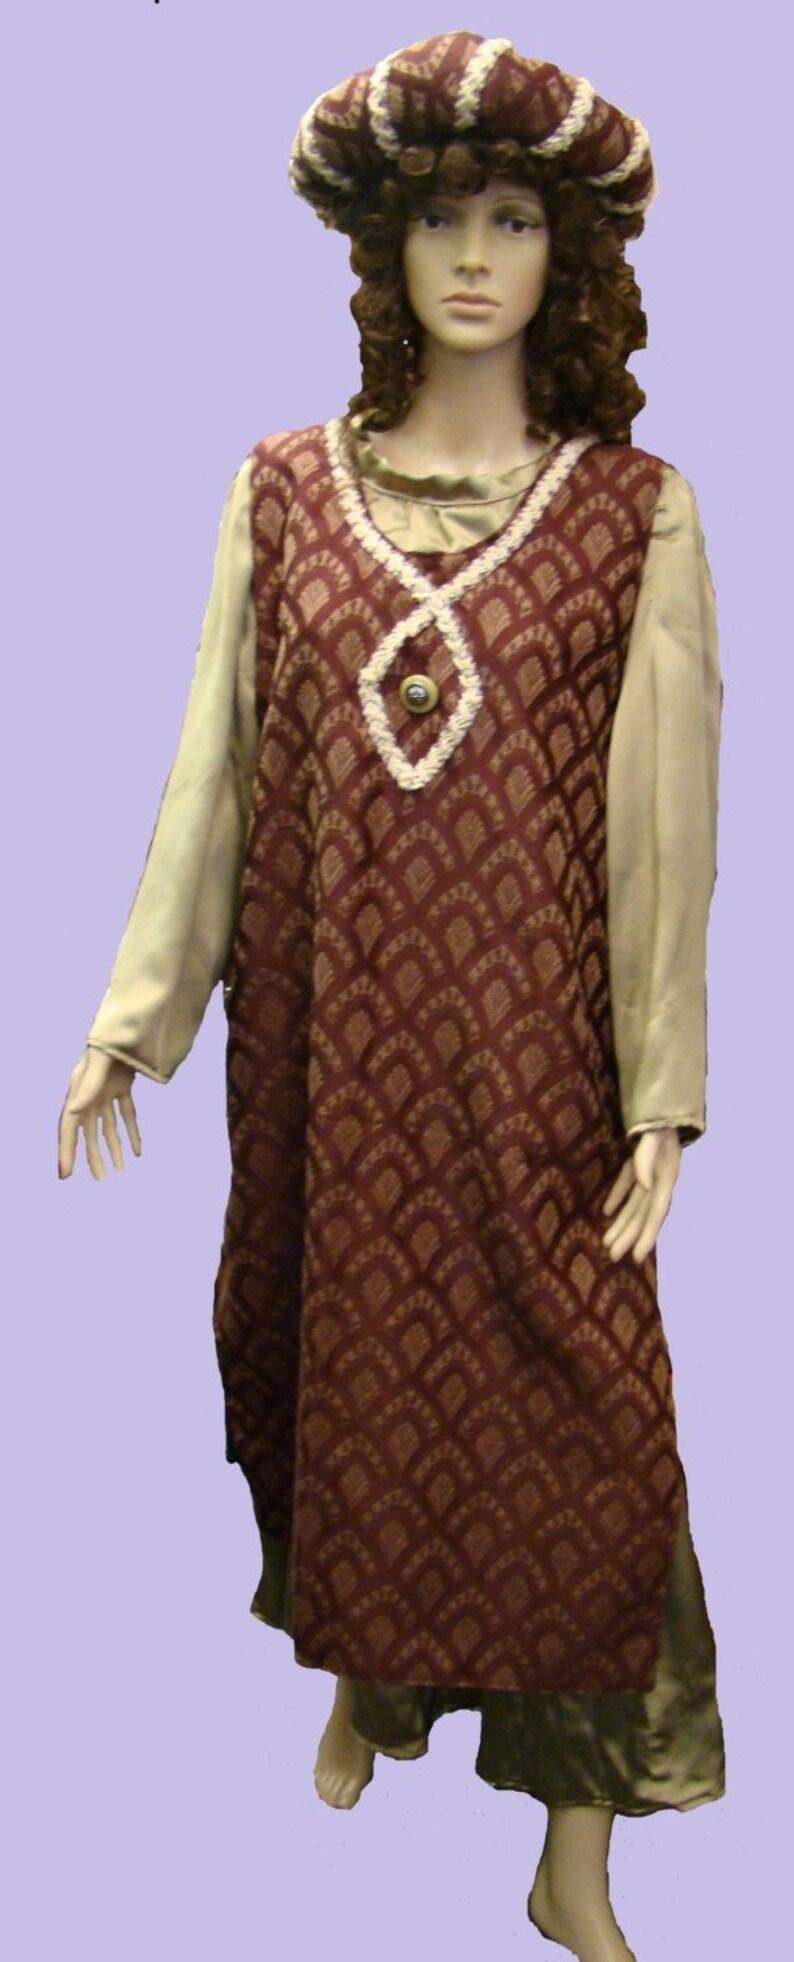 2950a206dc Price Reduced Costume Adult Woman Plus Size Renaissance Gown